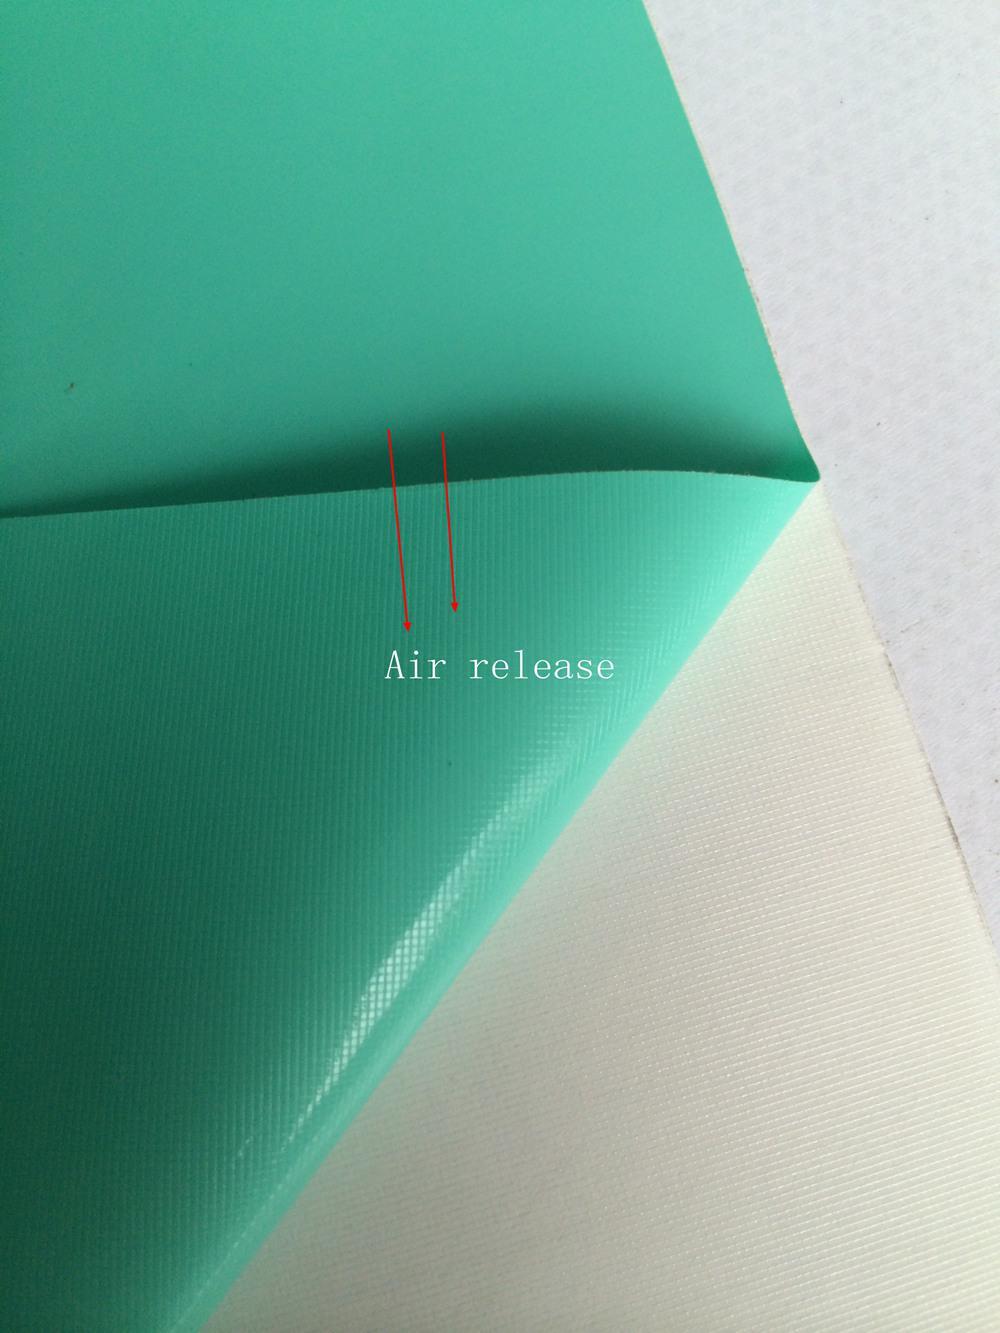 Premium Matt Tiffany Blå Vinyl Bilförpackning Film med luftbubbla Free Mint Matte Film Wrap Cover Folie 1,52x30m / Roll 5x98ft